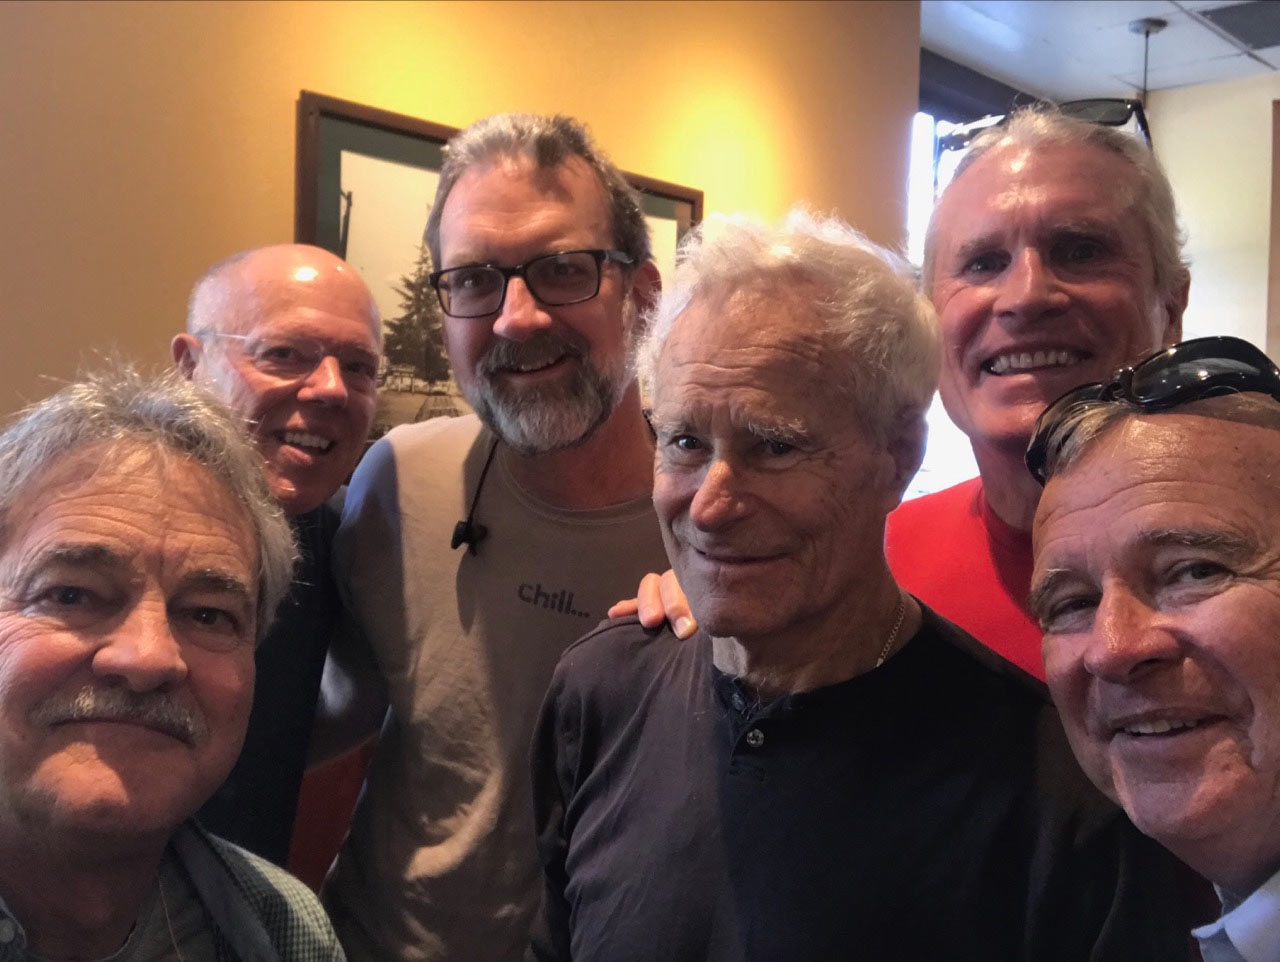 Gary's Personal Men's Group: Sam Pearson Artist, Gary Plep LCSW, Robert Land PsyD, Walter Jessen PhD (Octobert 1936- October 2018)), Beem Wilder PhD, Patrick Purcell MFT, Barry Hayes PhD (below).